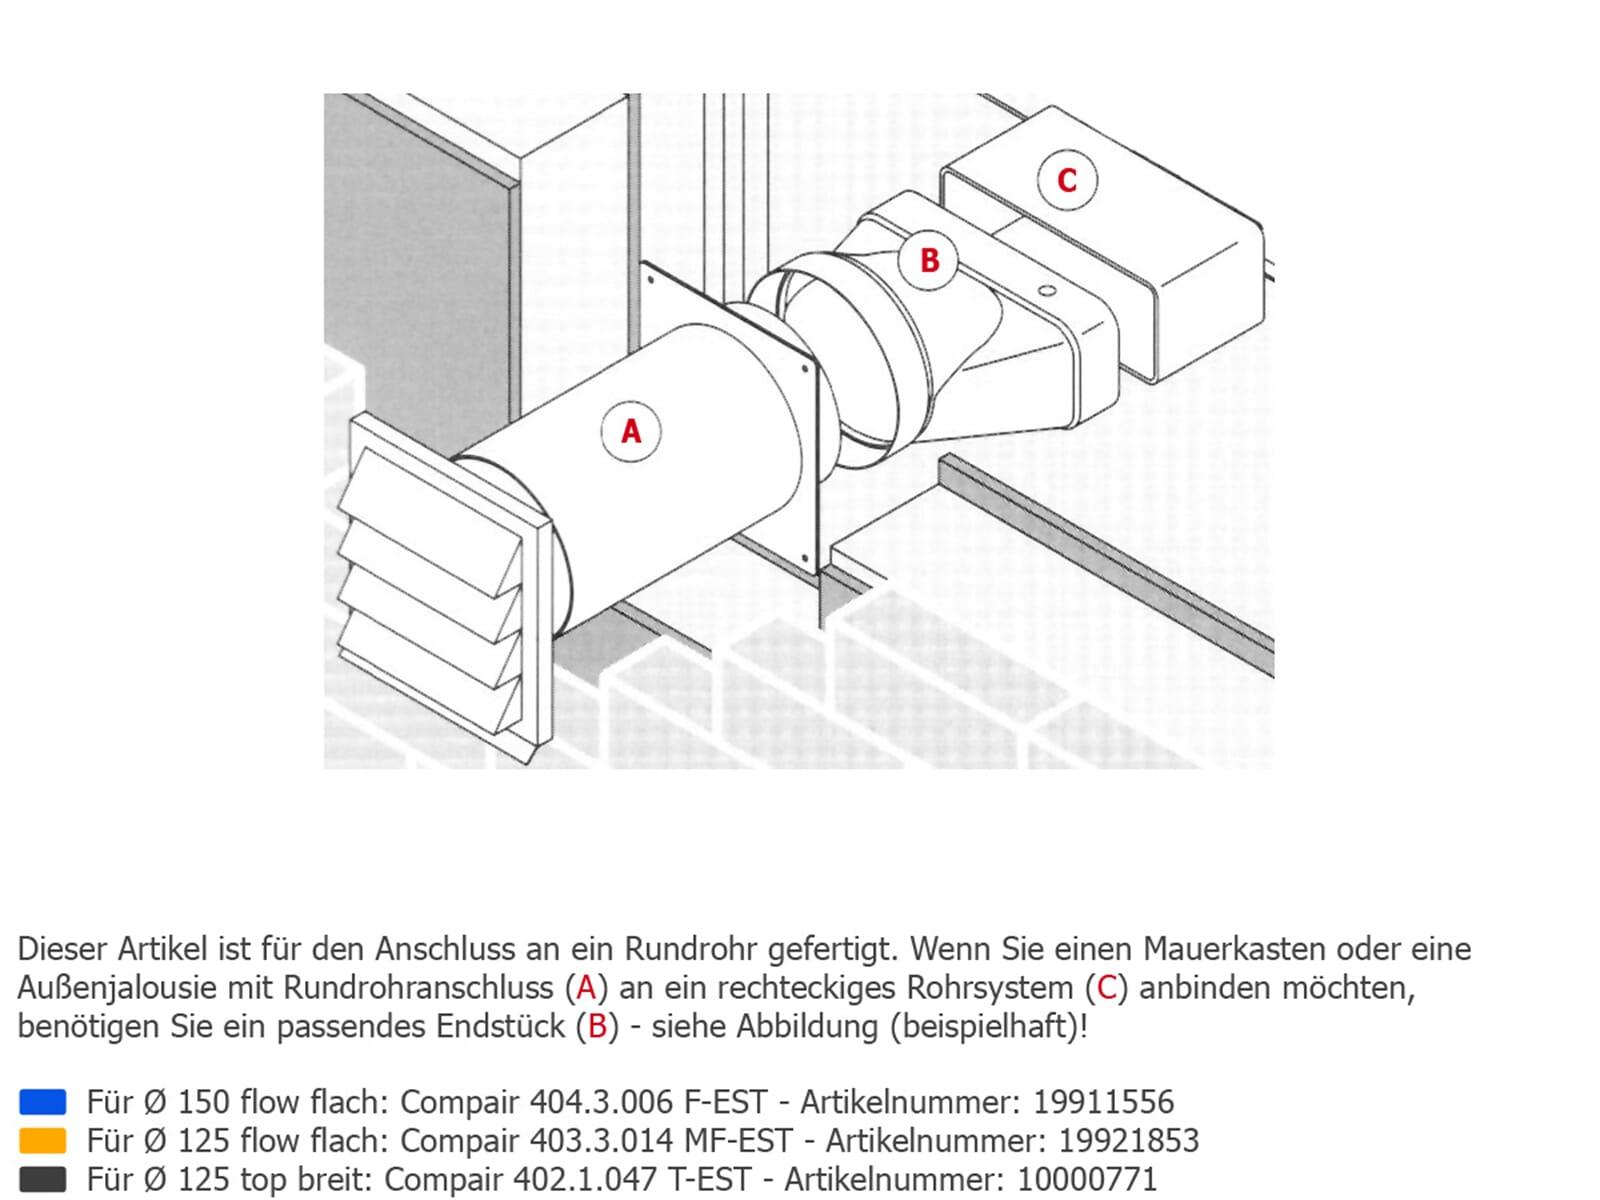 Compair 404.3.021 Flow 150 Dachlüfter